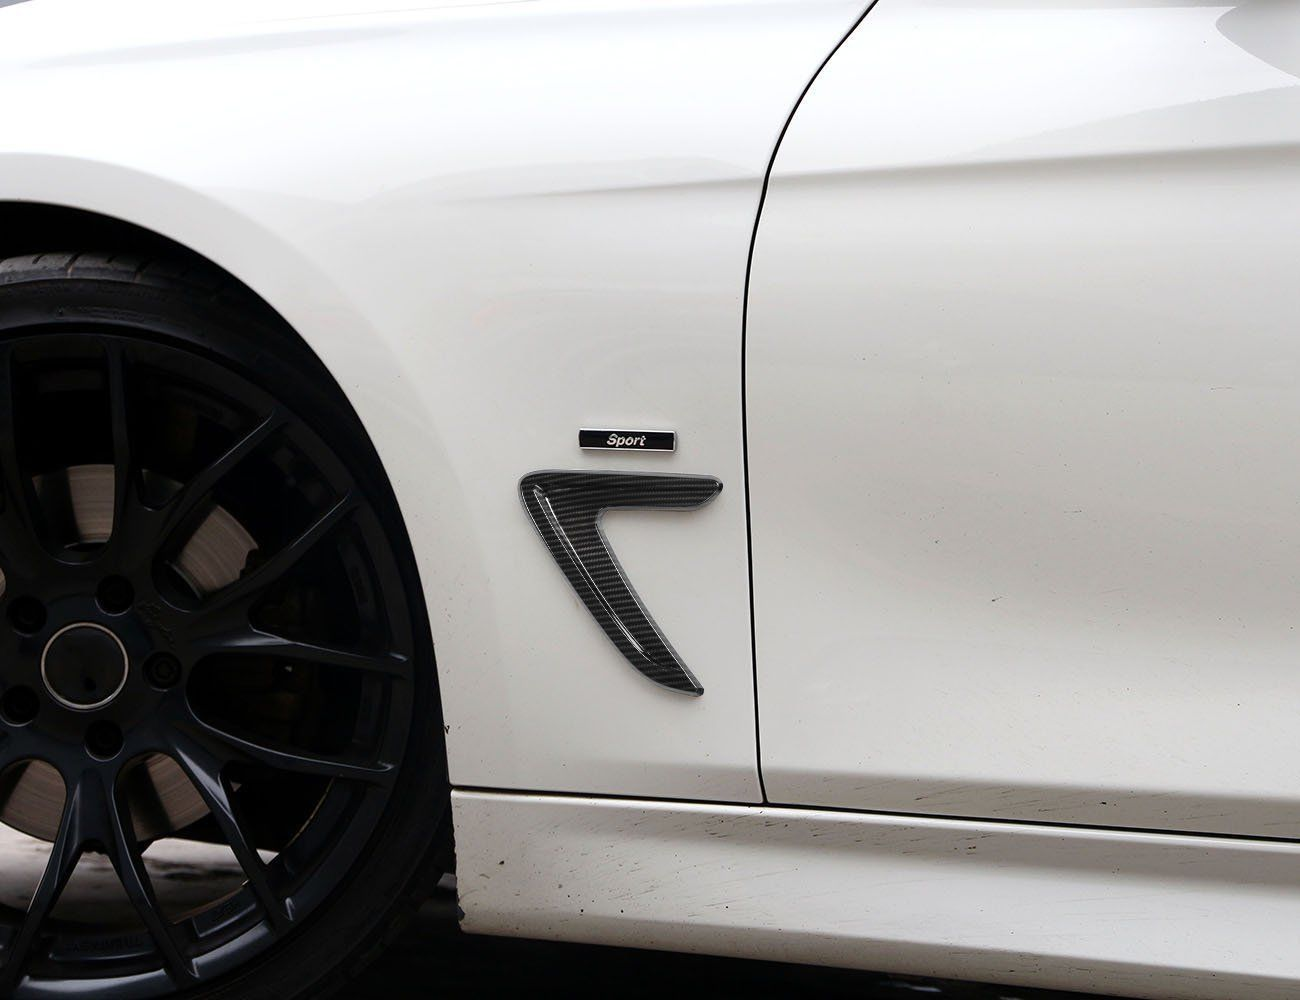 2 PCS Carbon Fiber Style Fender Vents Decorative Sticker Frame For BMW F30 F35 328I 2012-2017